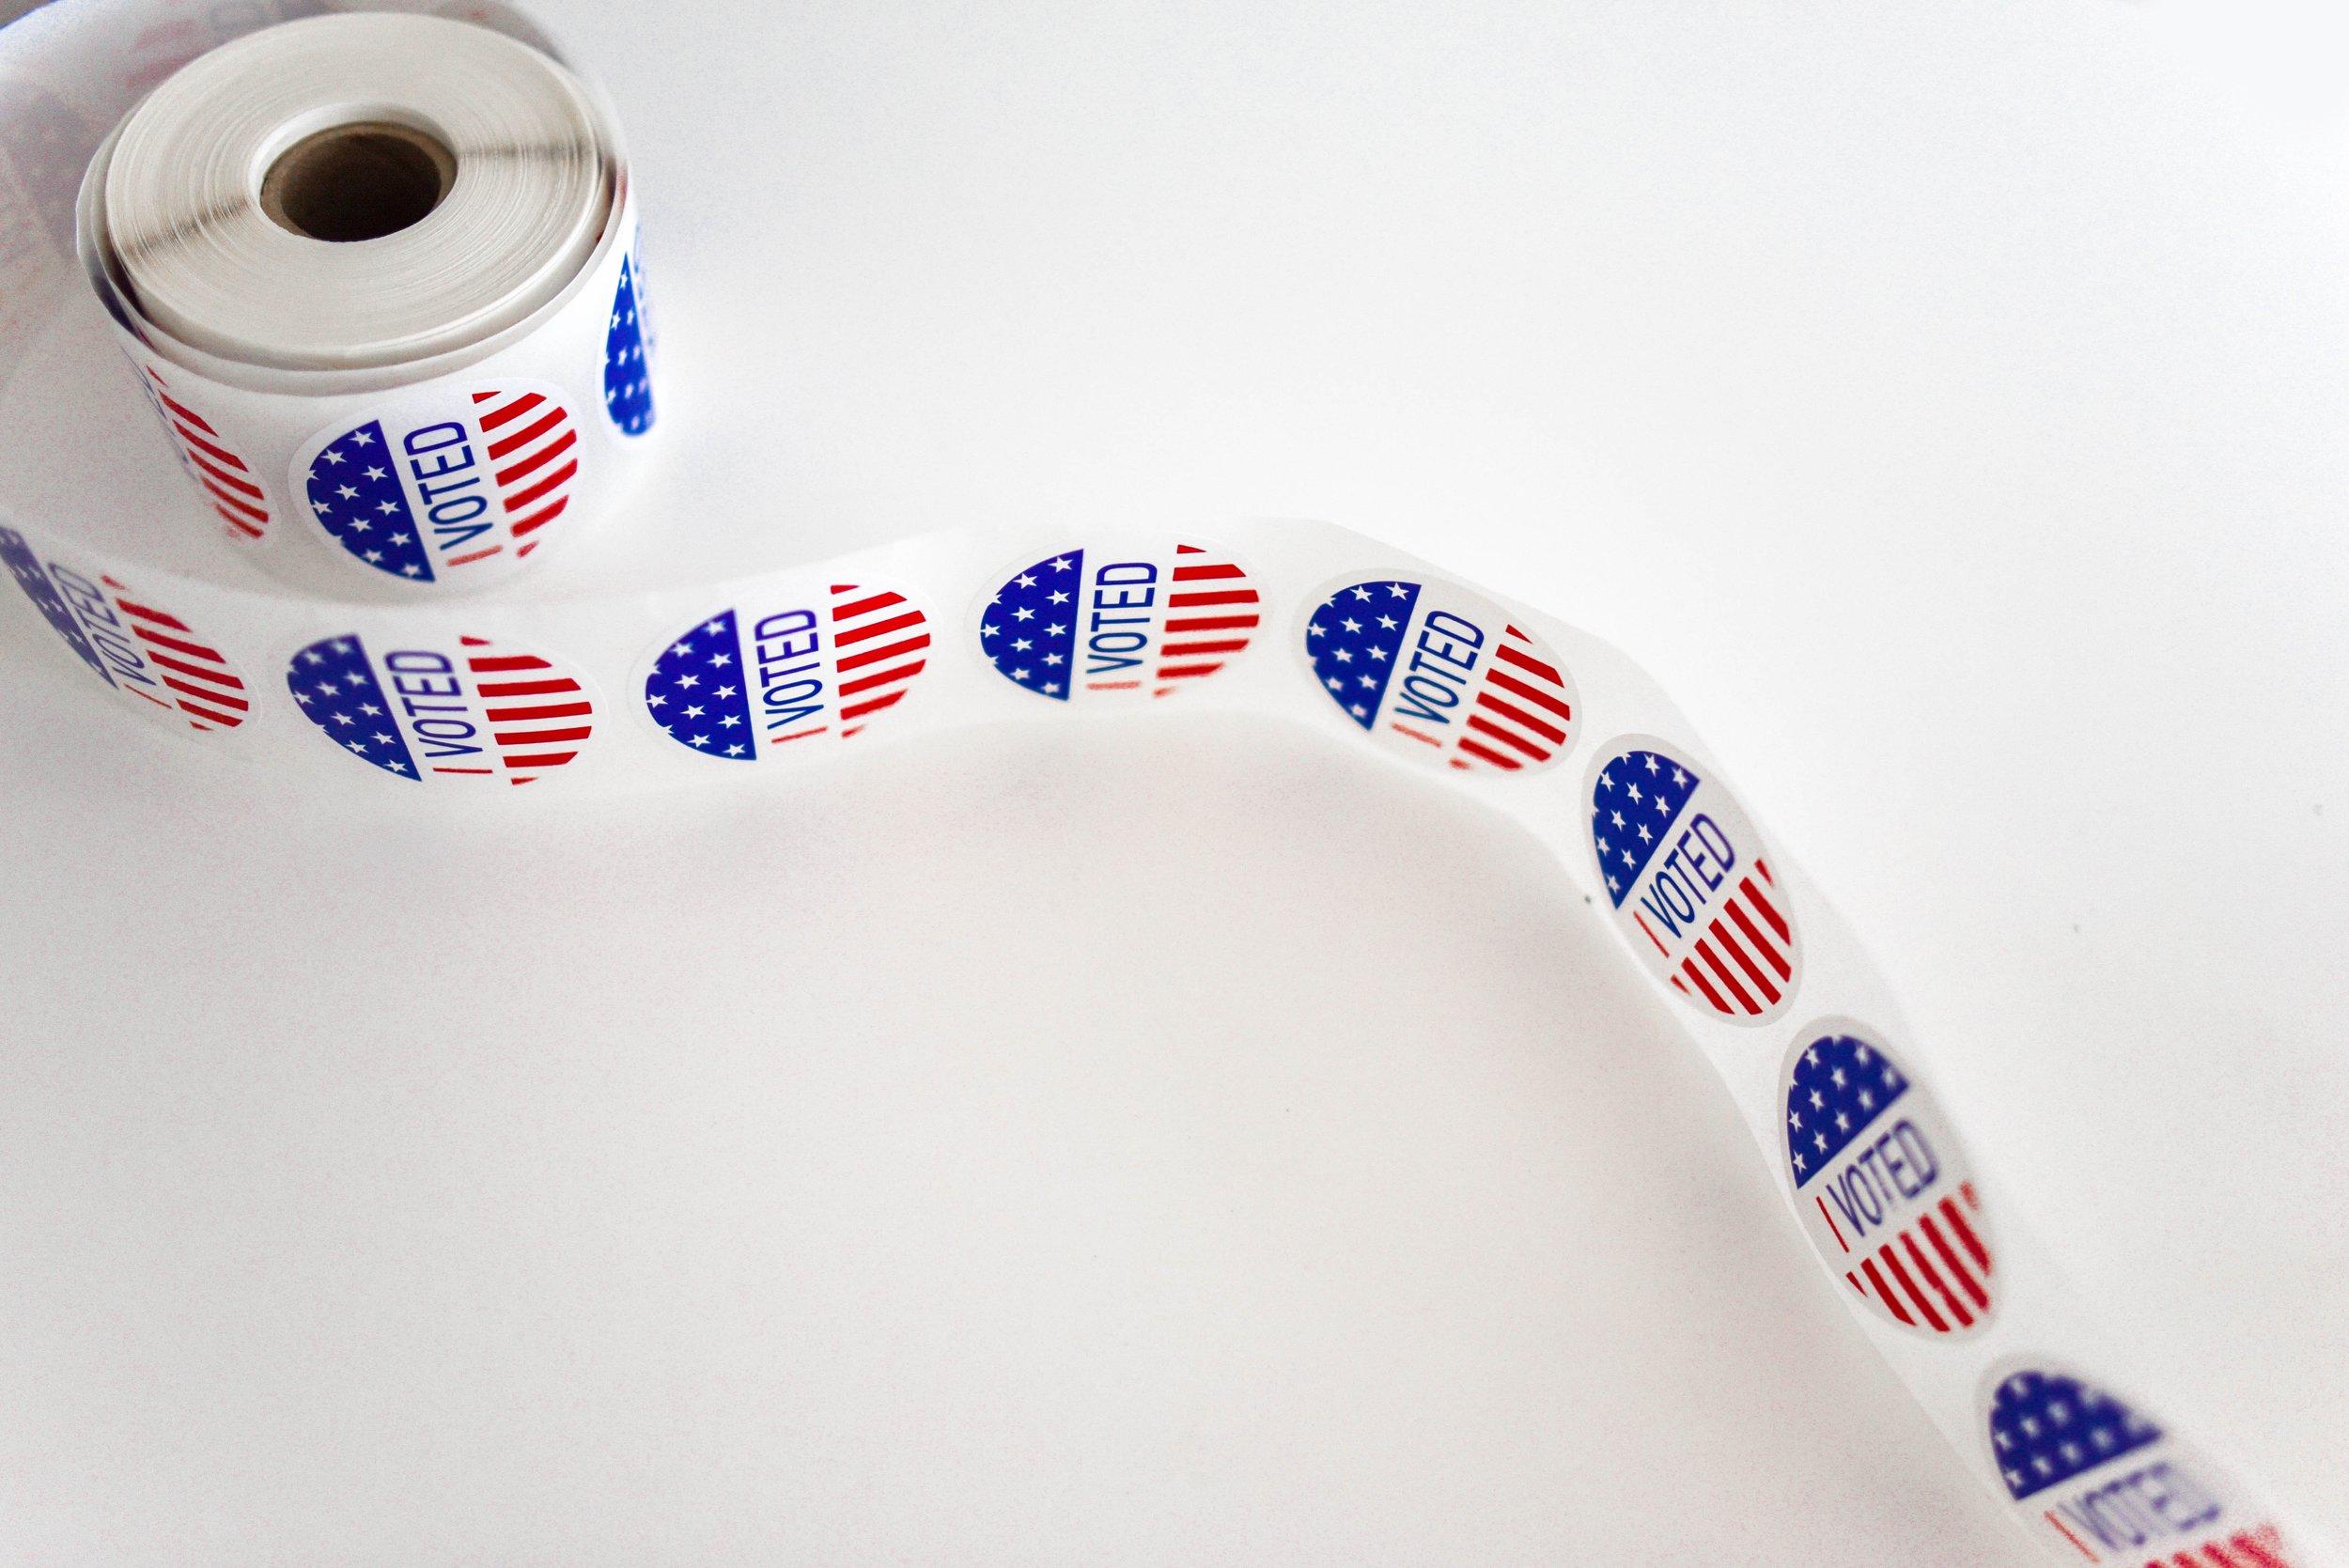 america-american-flag-ballot-1550336.jpg